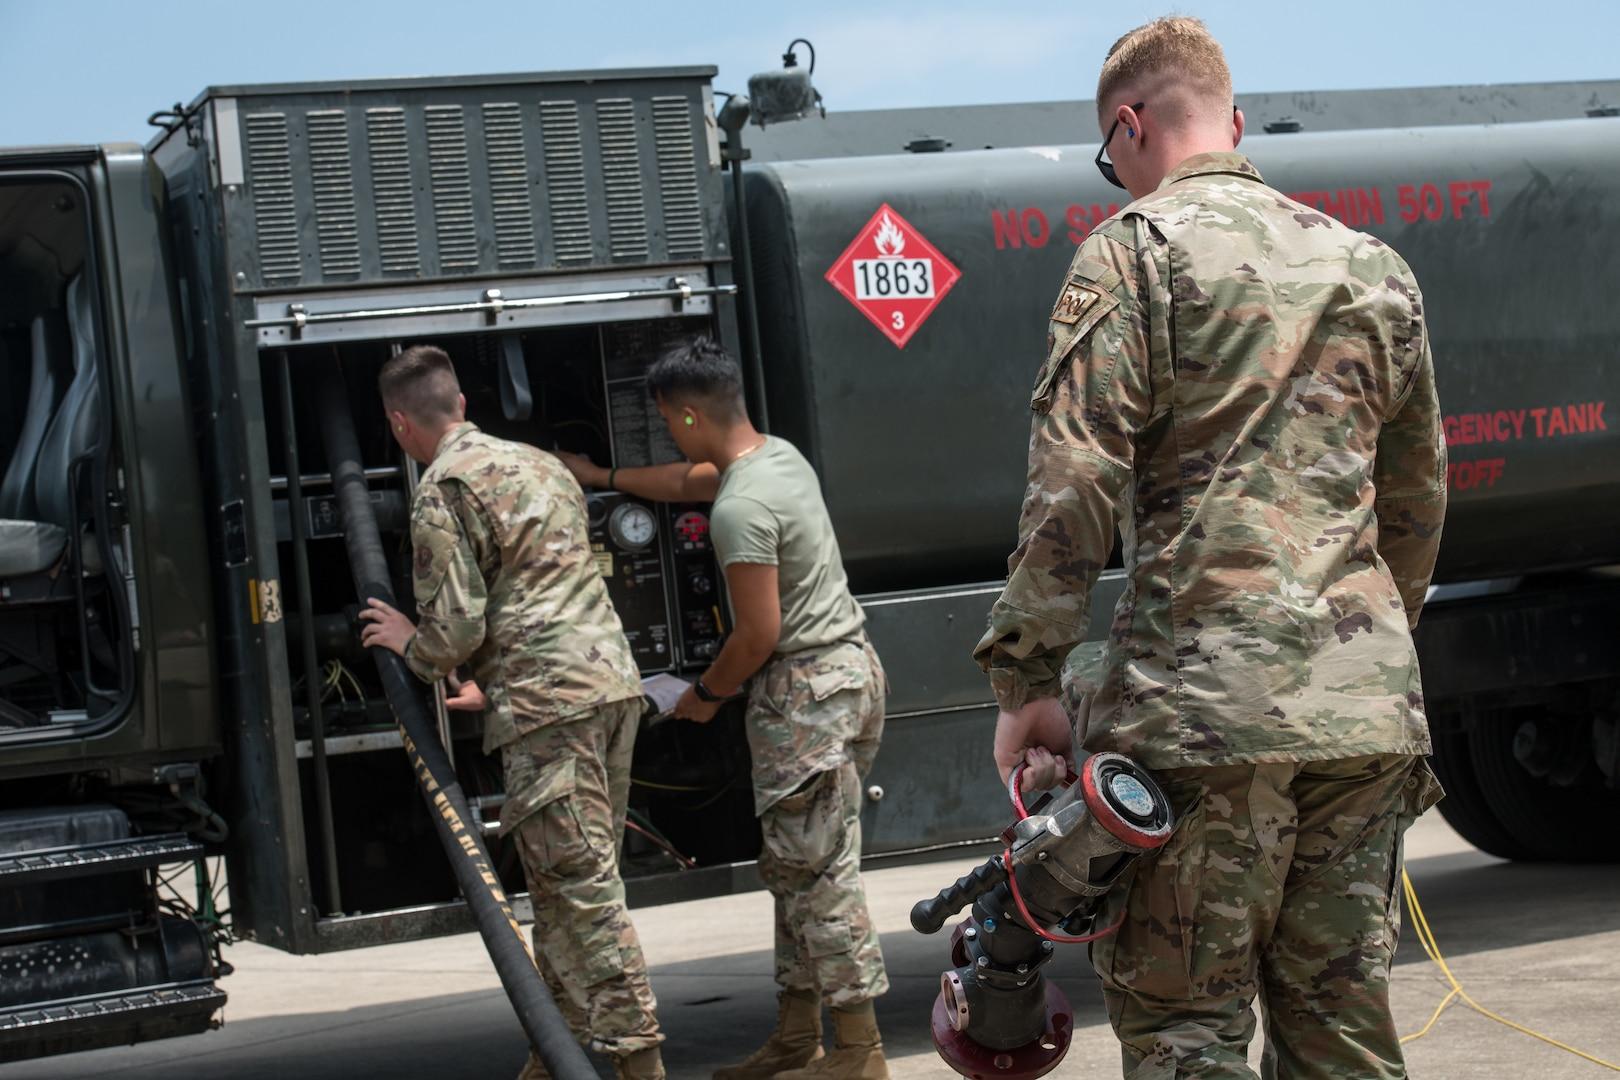 Men move a fuel hose back onto a truck